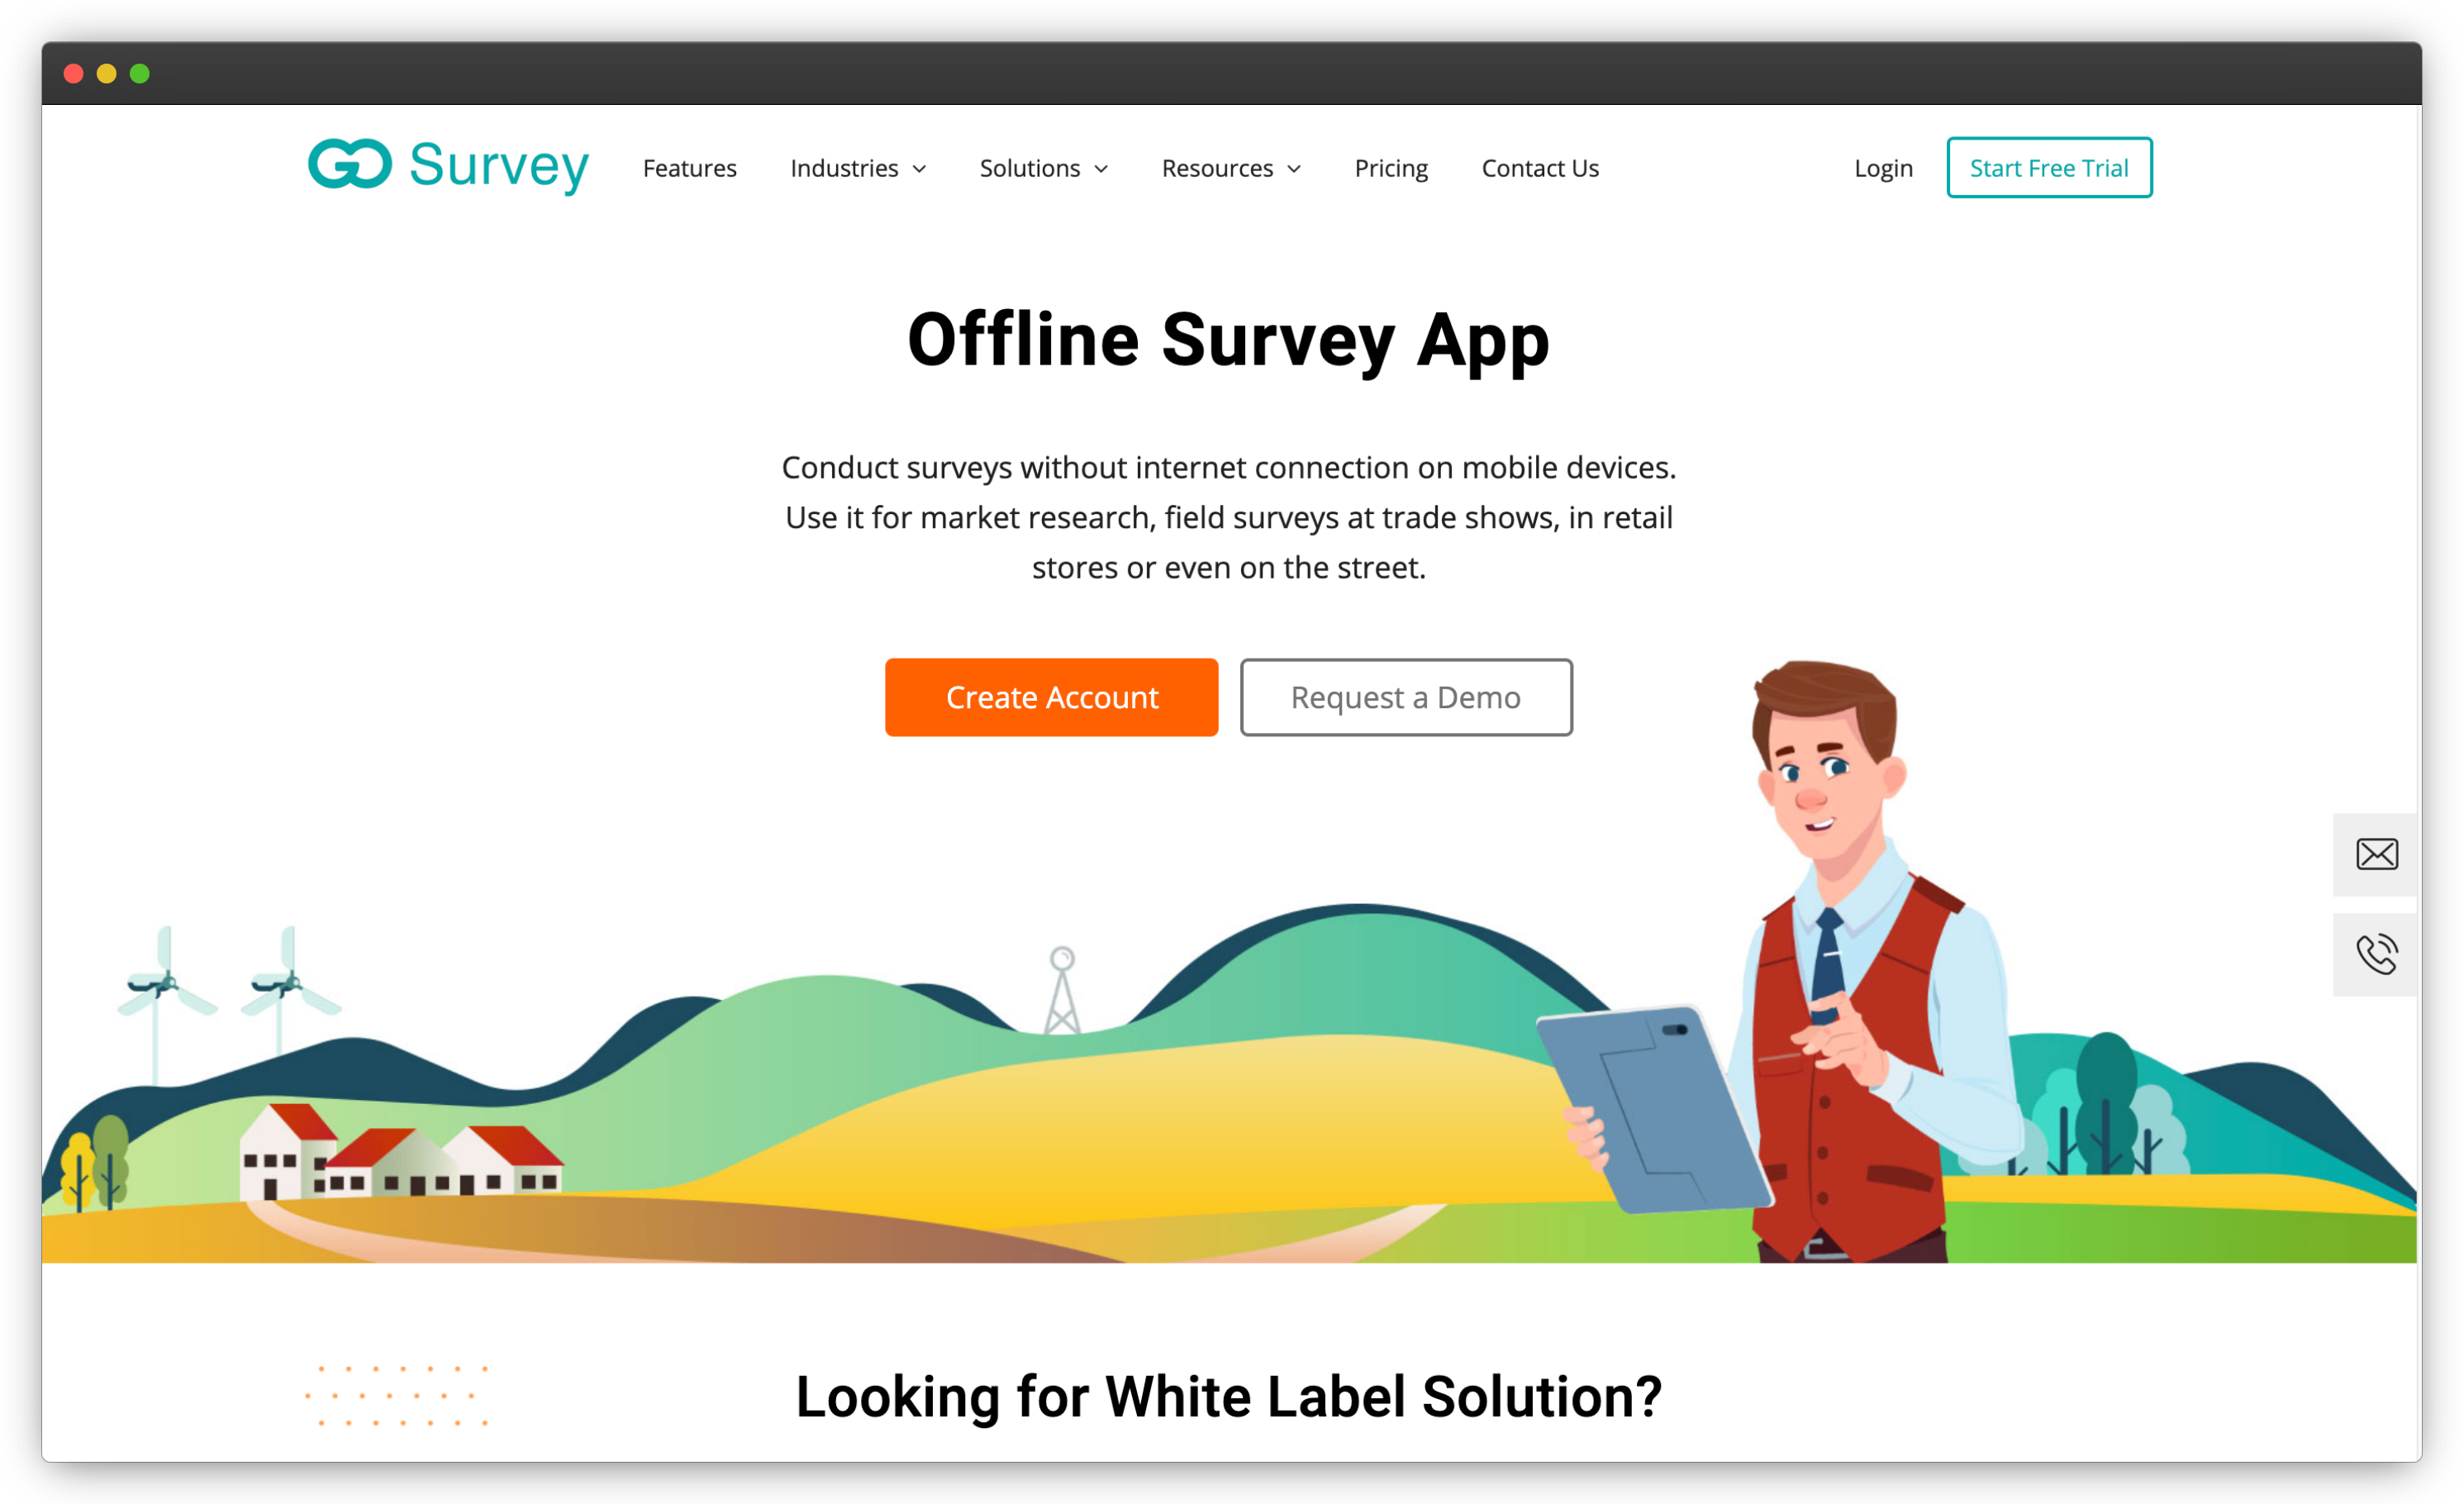 GoSurvey Android Survey App